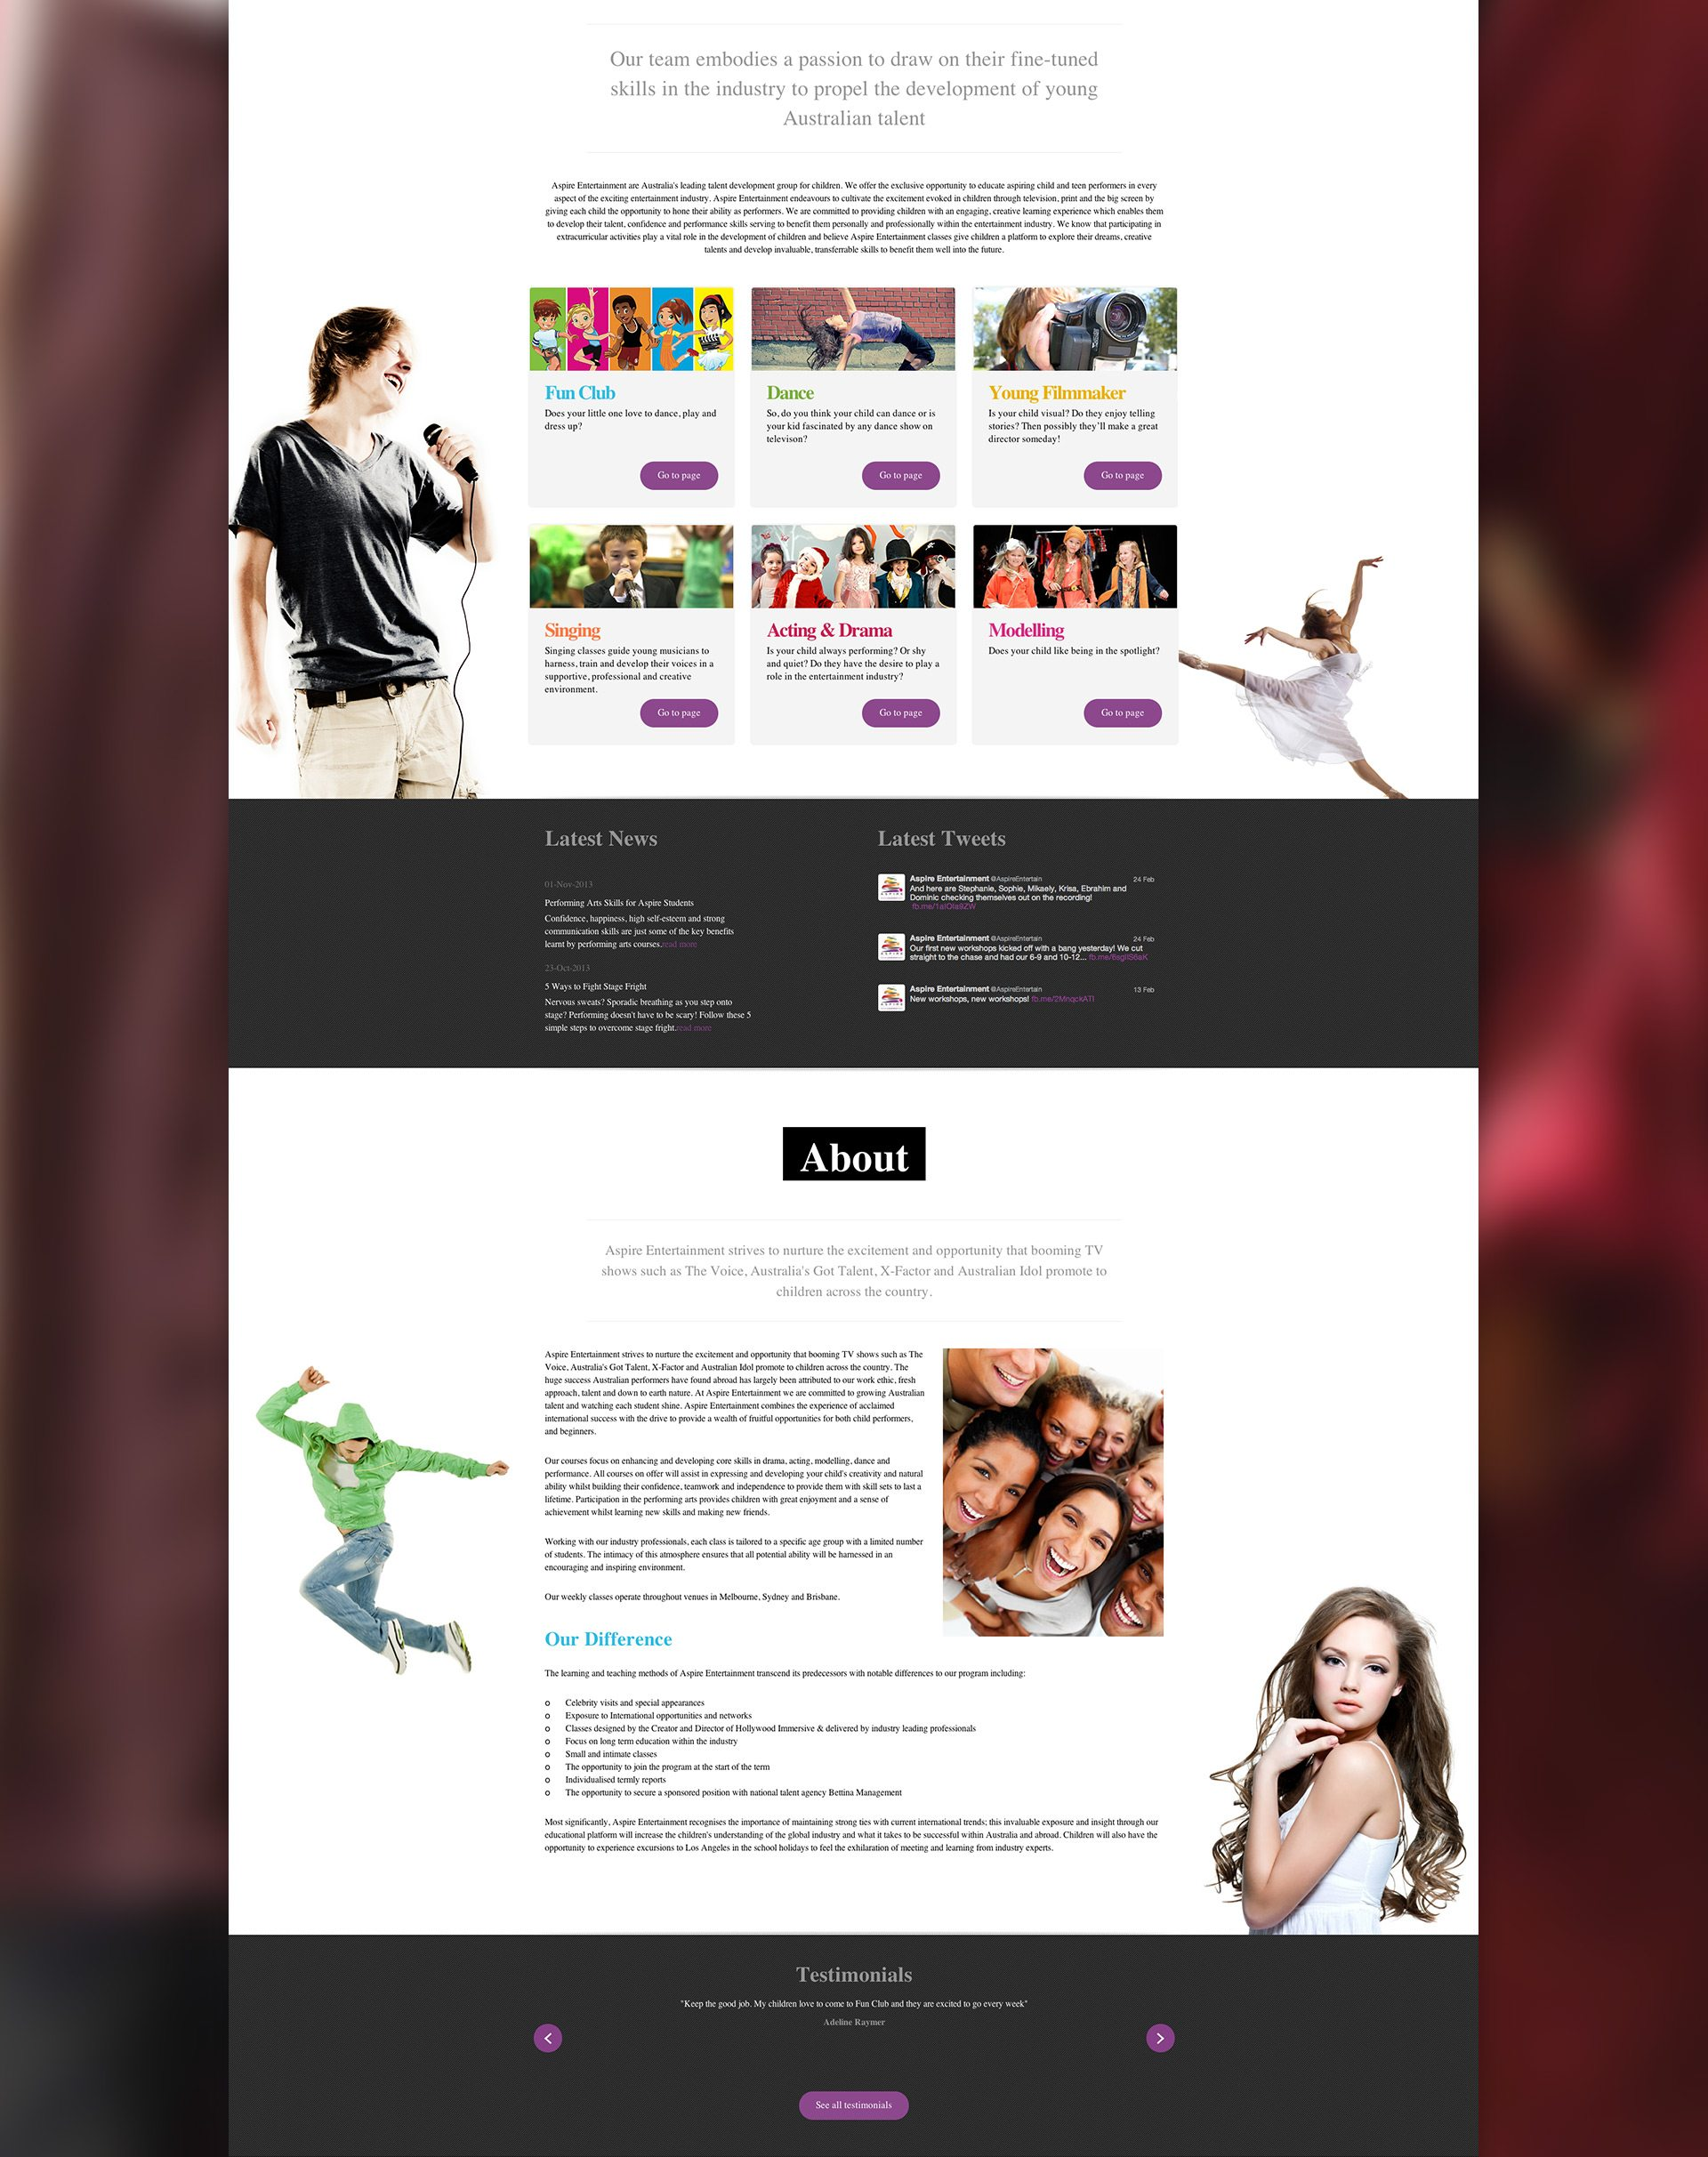 53fab8919361c1596090e752_Aspire-ProjectPart-2.jpg